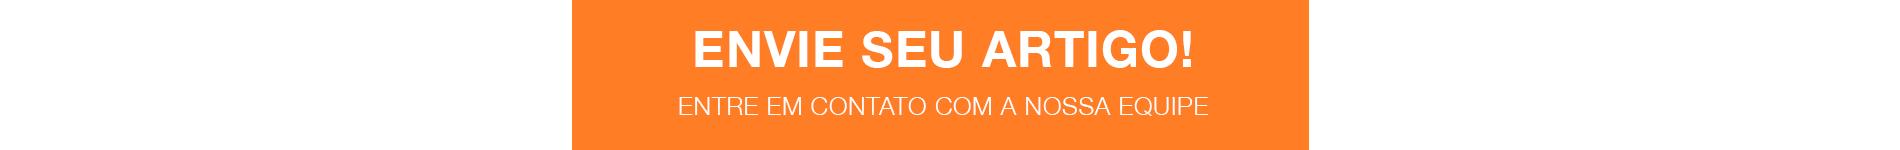 https://www.mestregp.com.br/wp-content/uploads/2018/01/botao_envietcc-1900x150.png